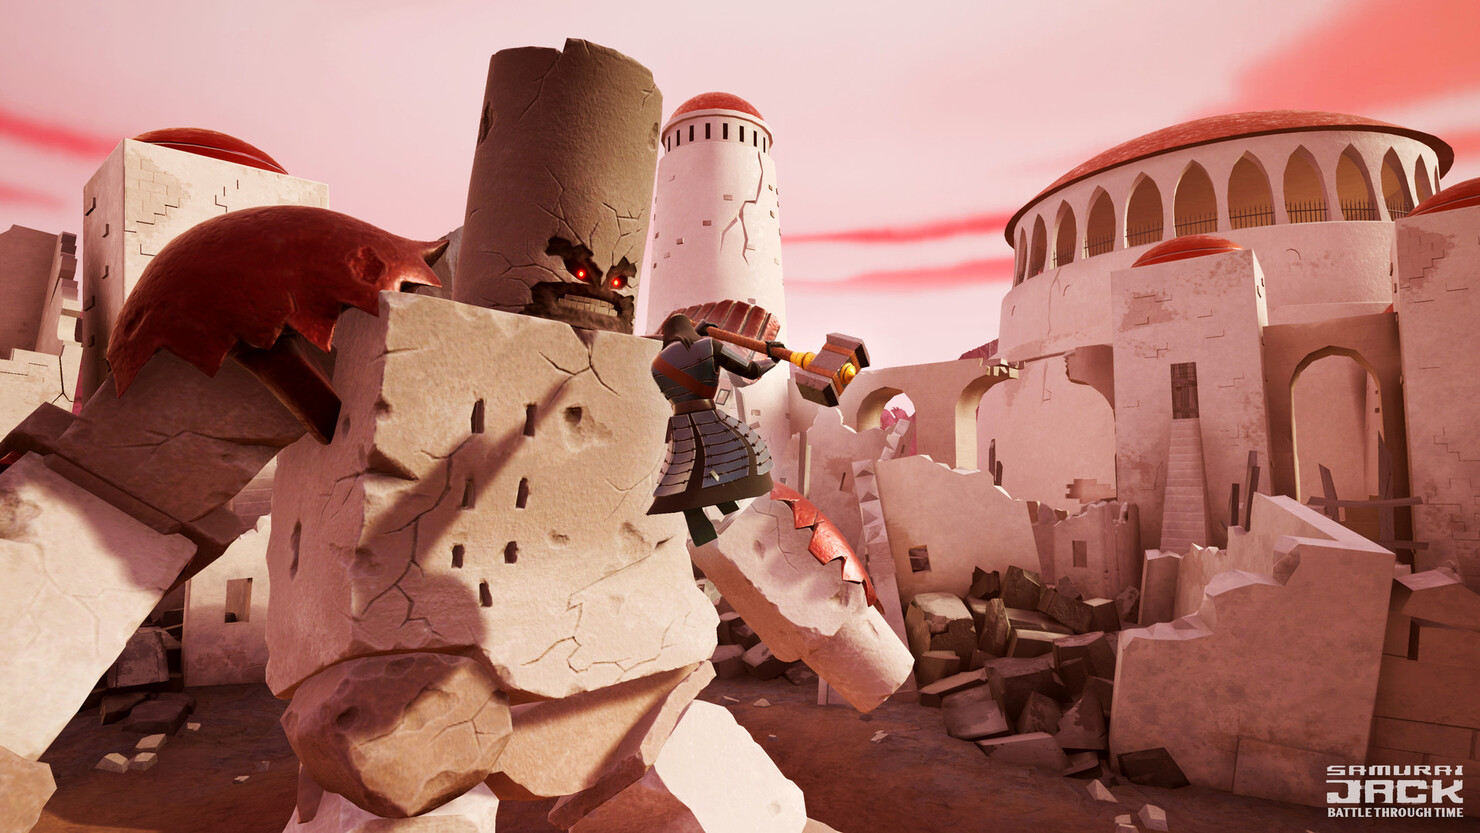 Кадры из игры Samurai Jack: Battle Through Time